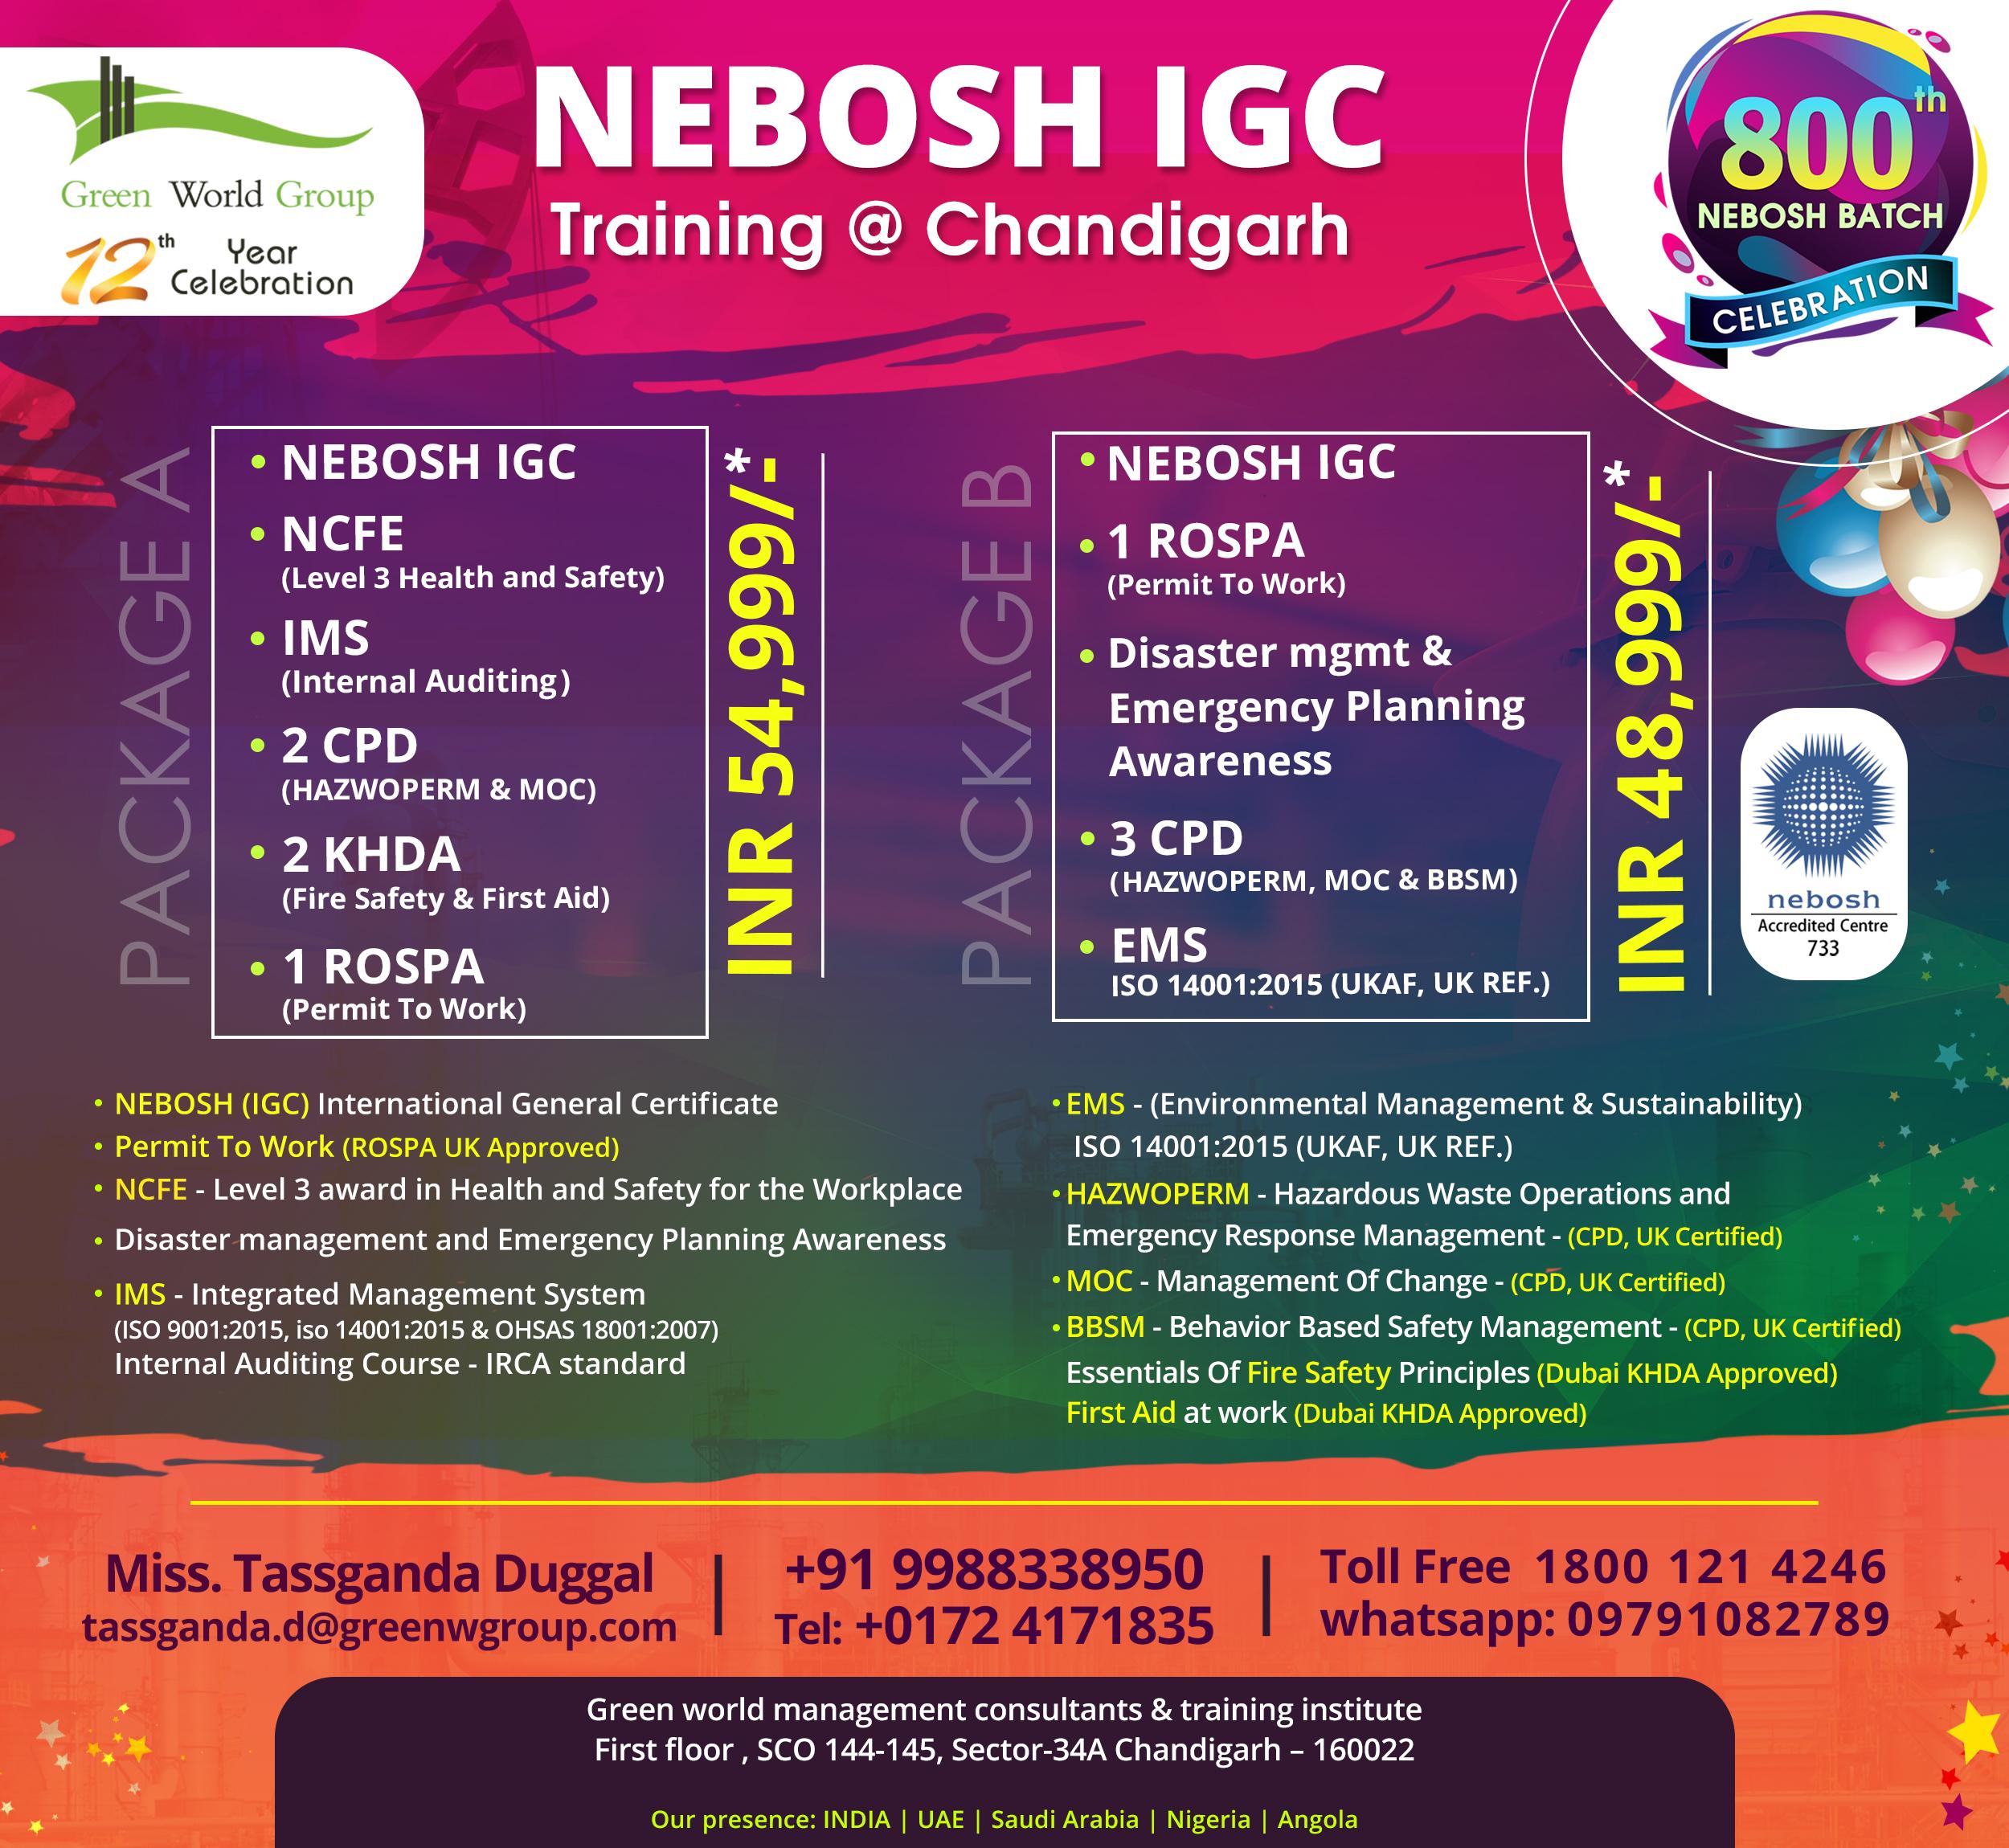 NEBOSH-IGC_800th_Batch_Chandigarh